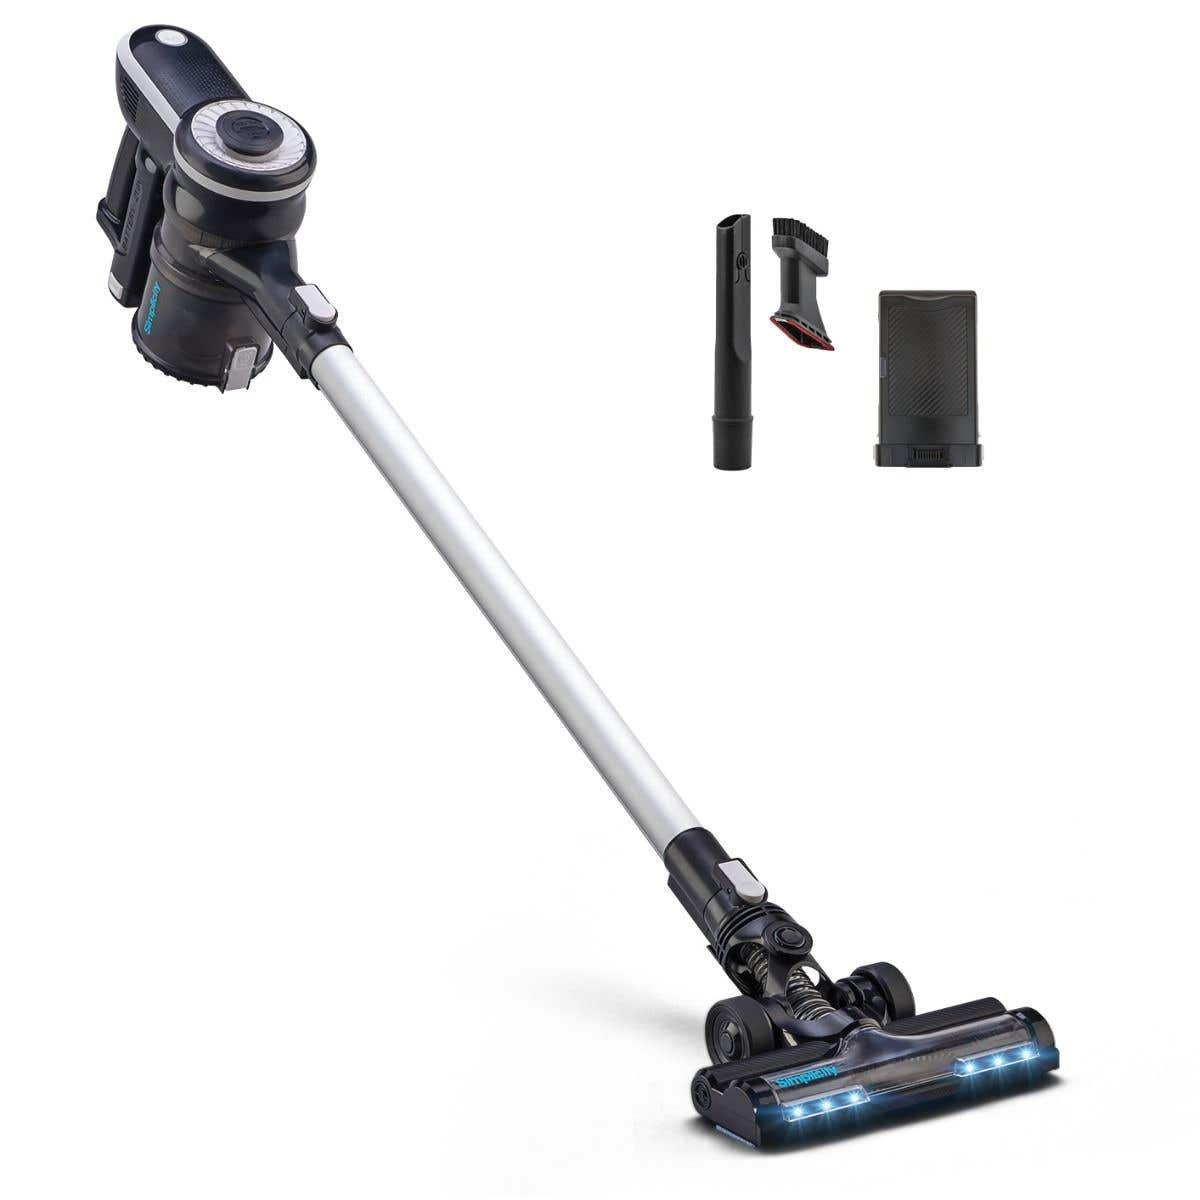 Simplicity S65S Standard Cordless Multi-Use Vacuum